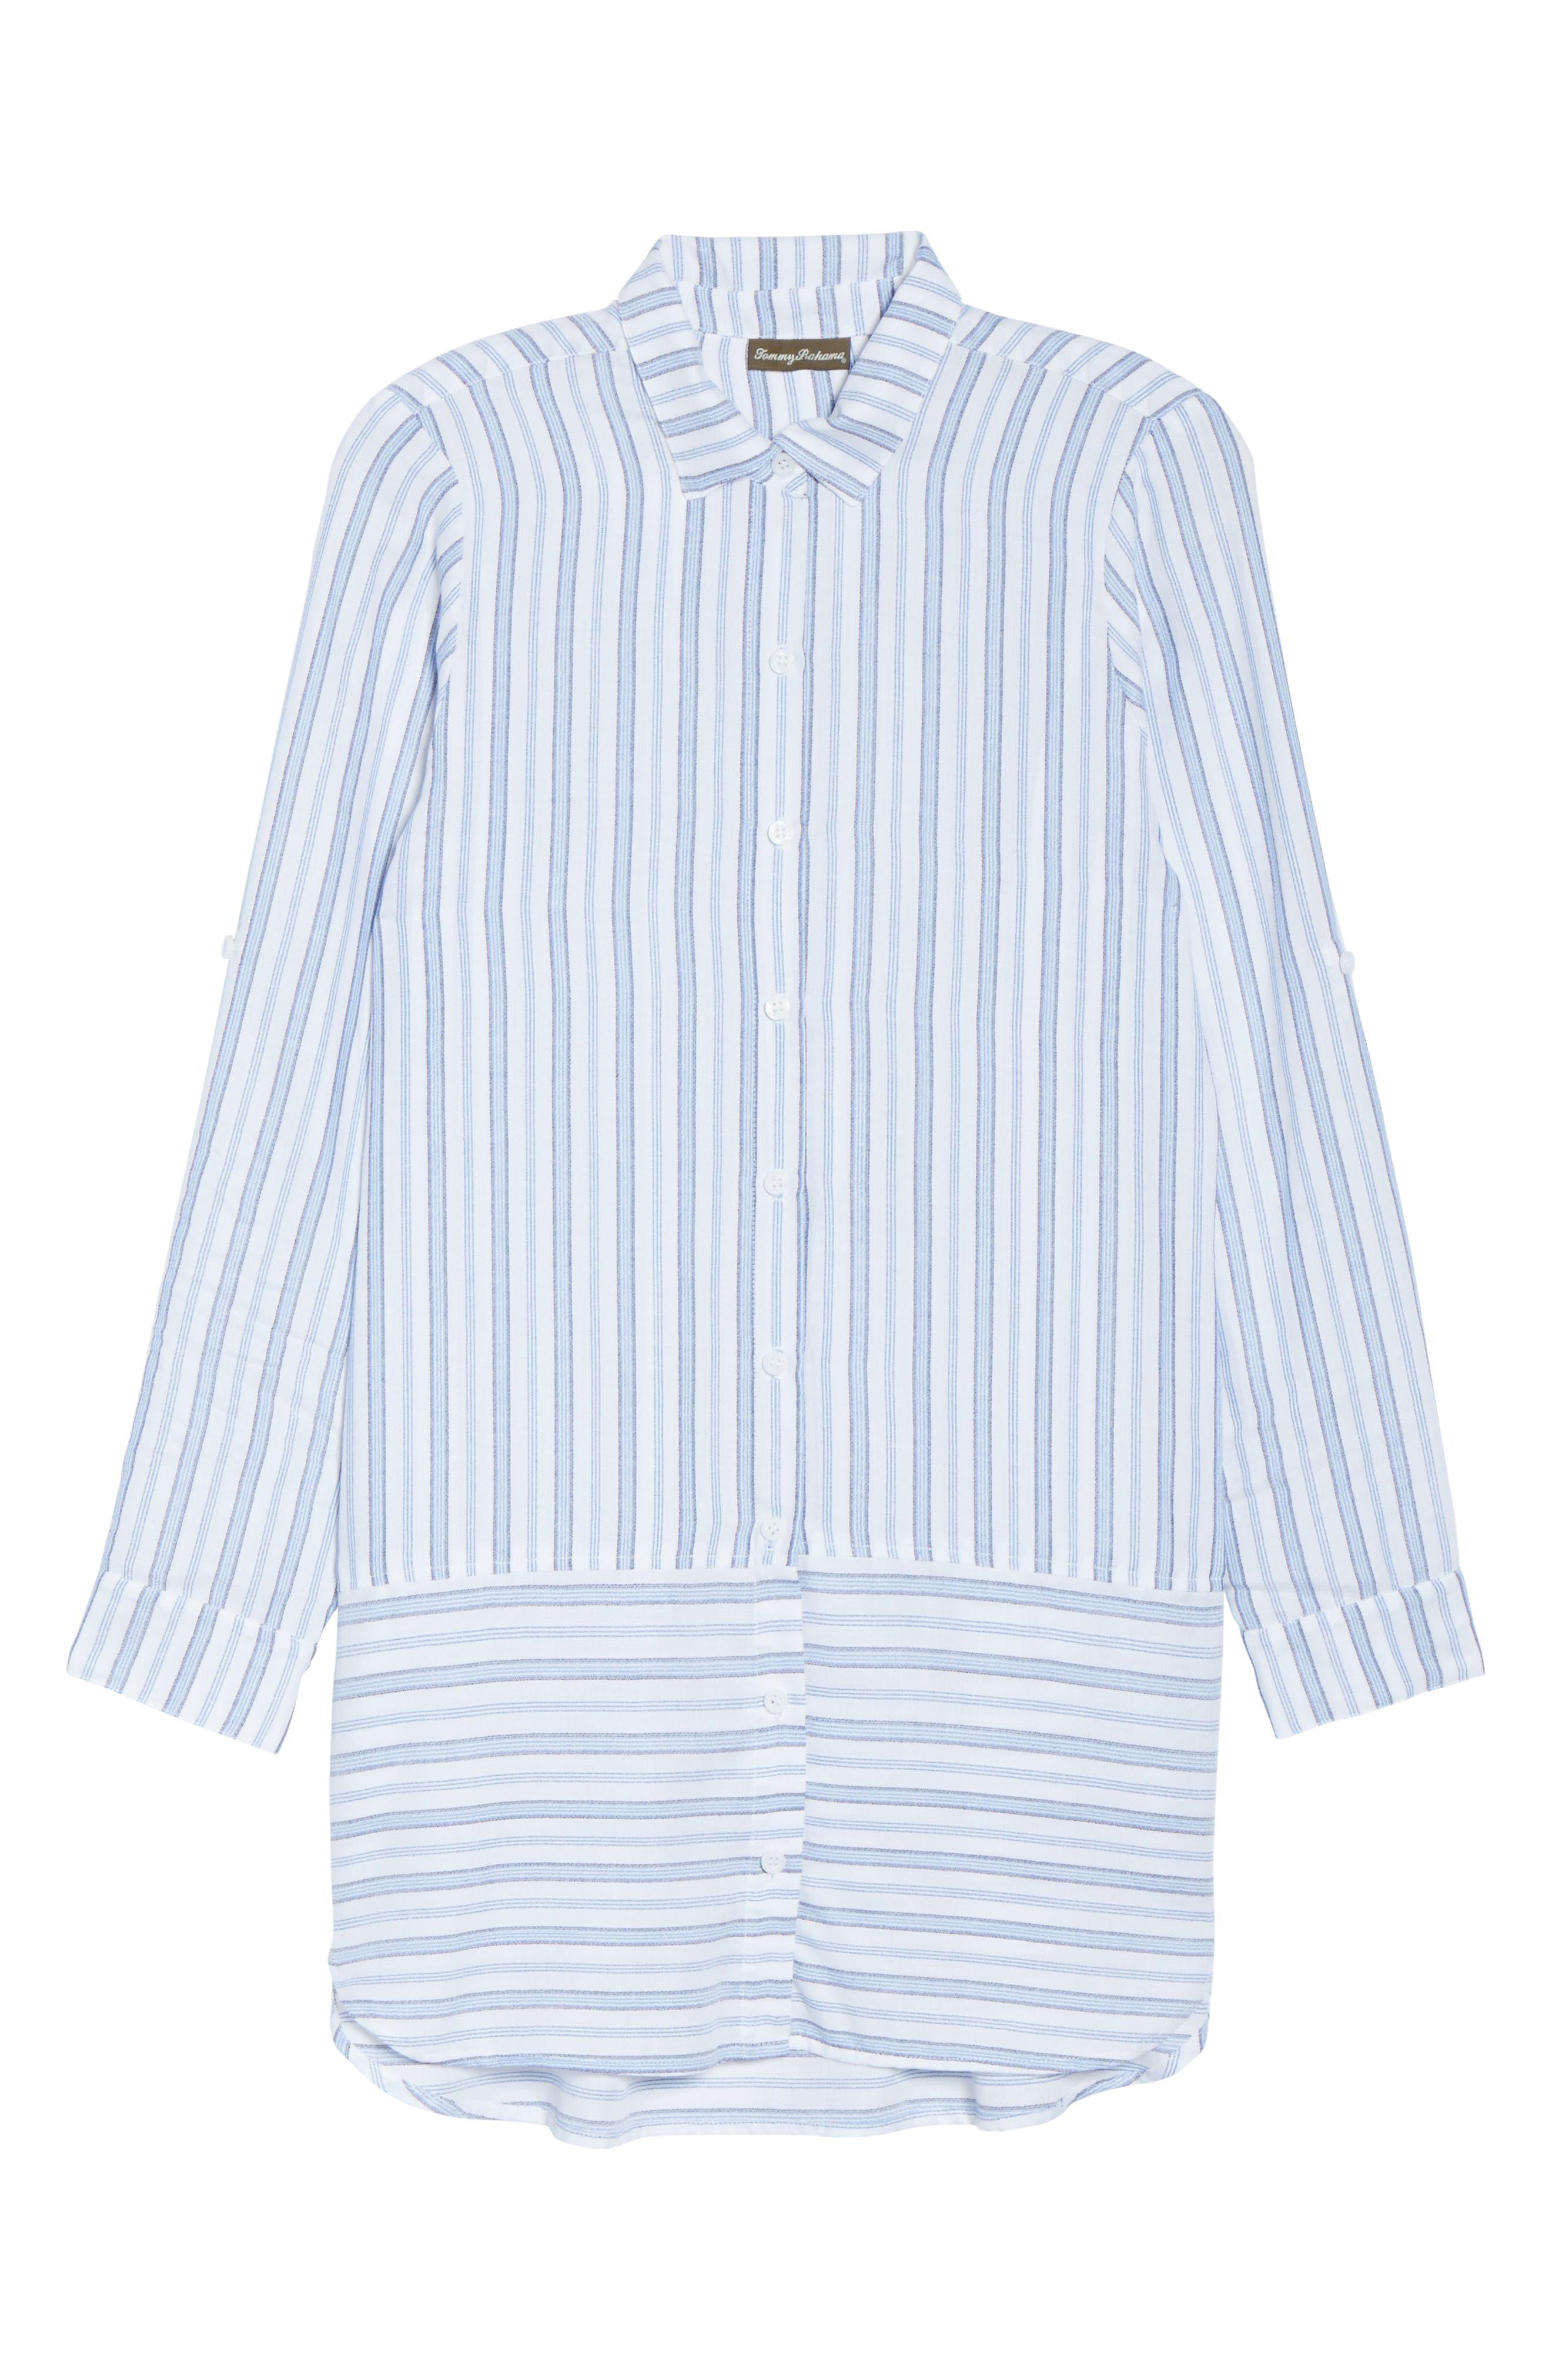 Ticking Stripe Cover-Up Shirtdress,                             Alternate thumbnail 6, color,                             White